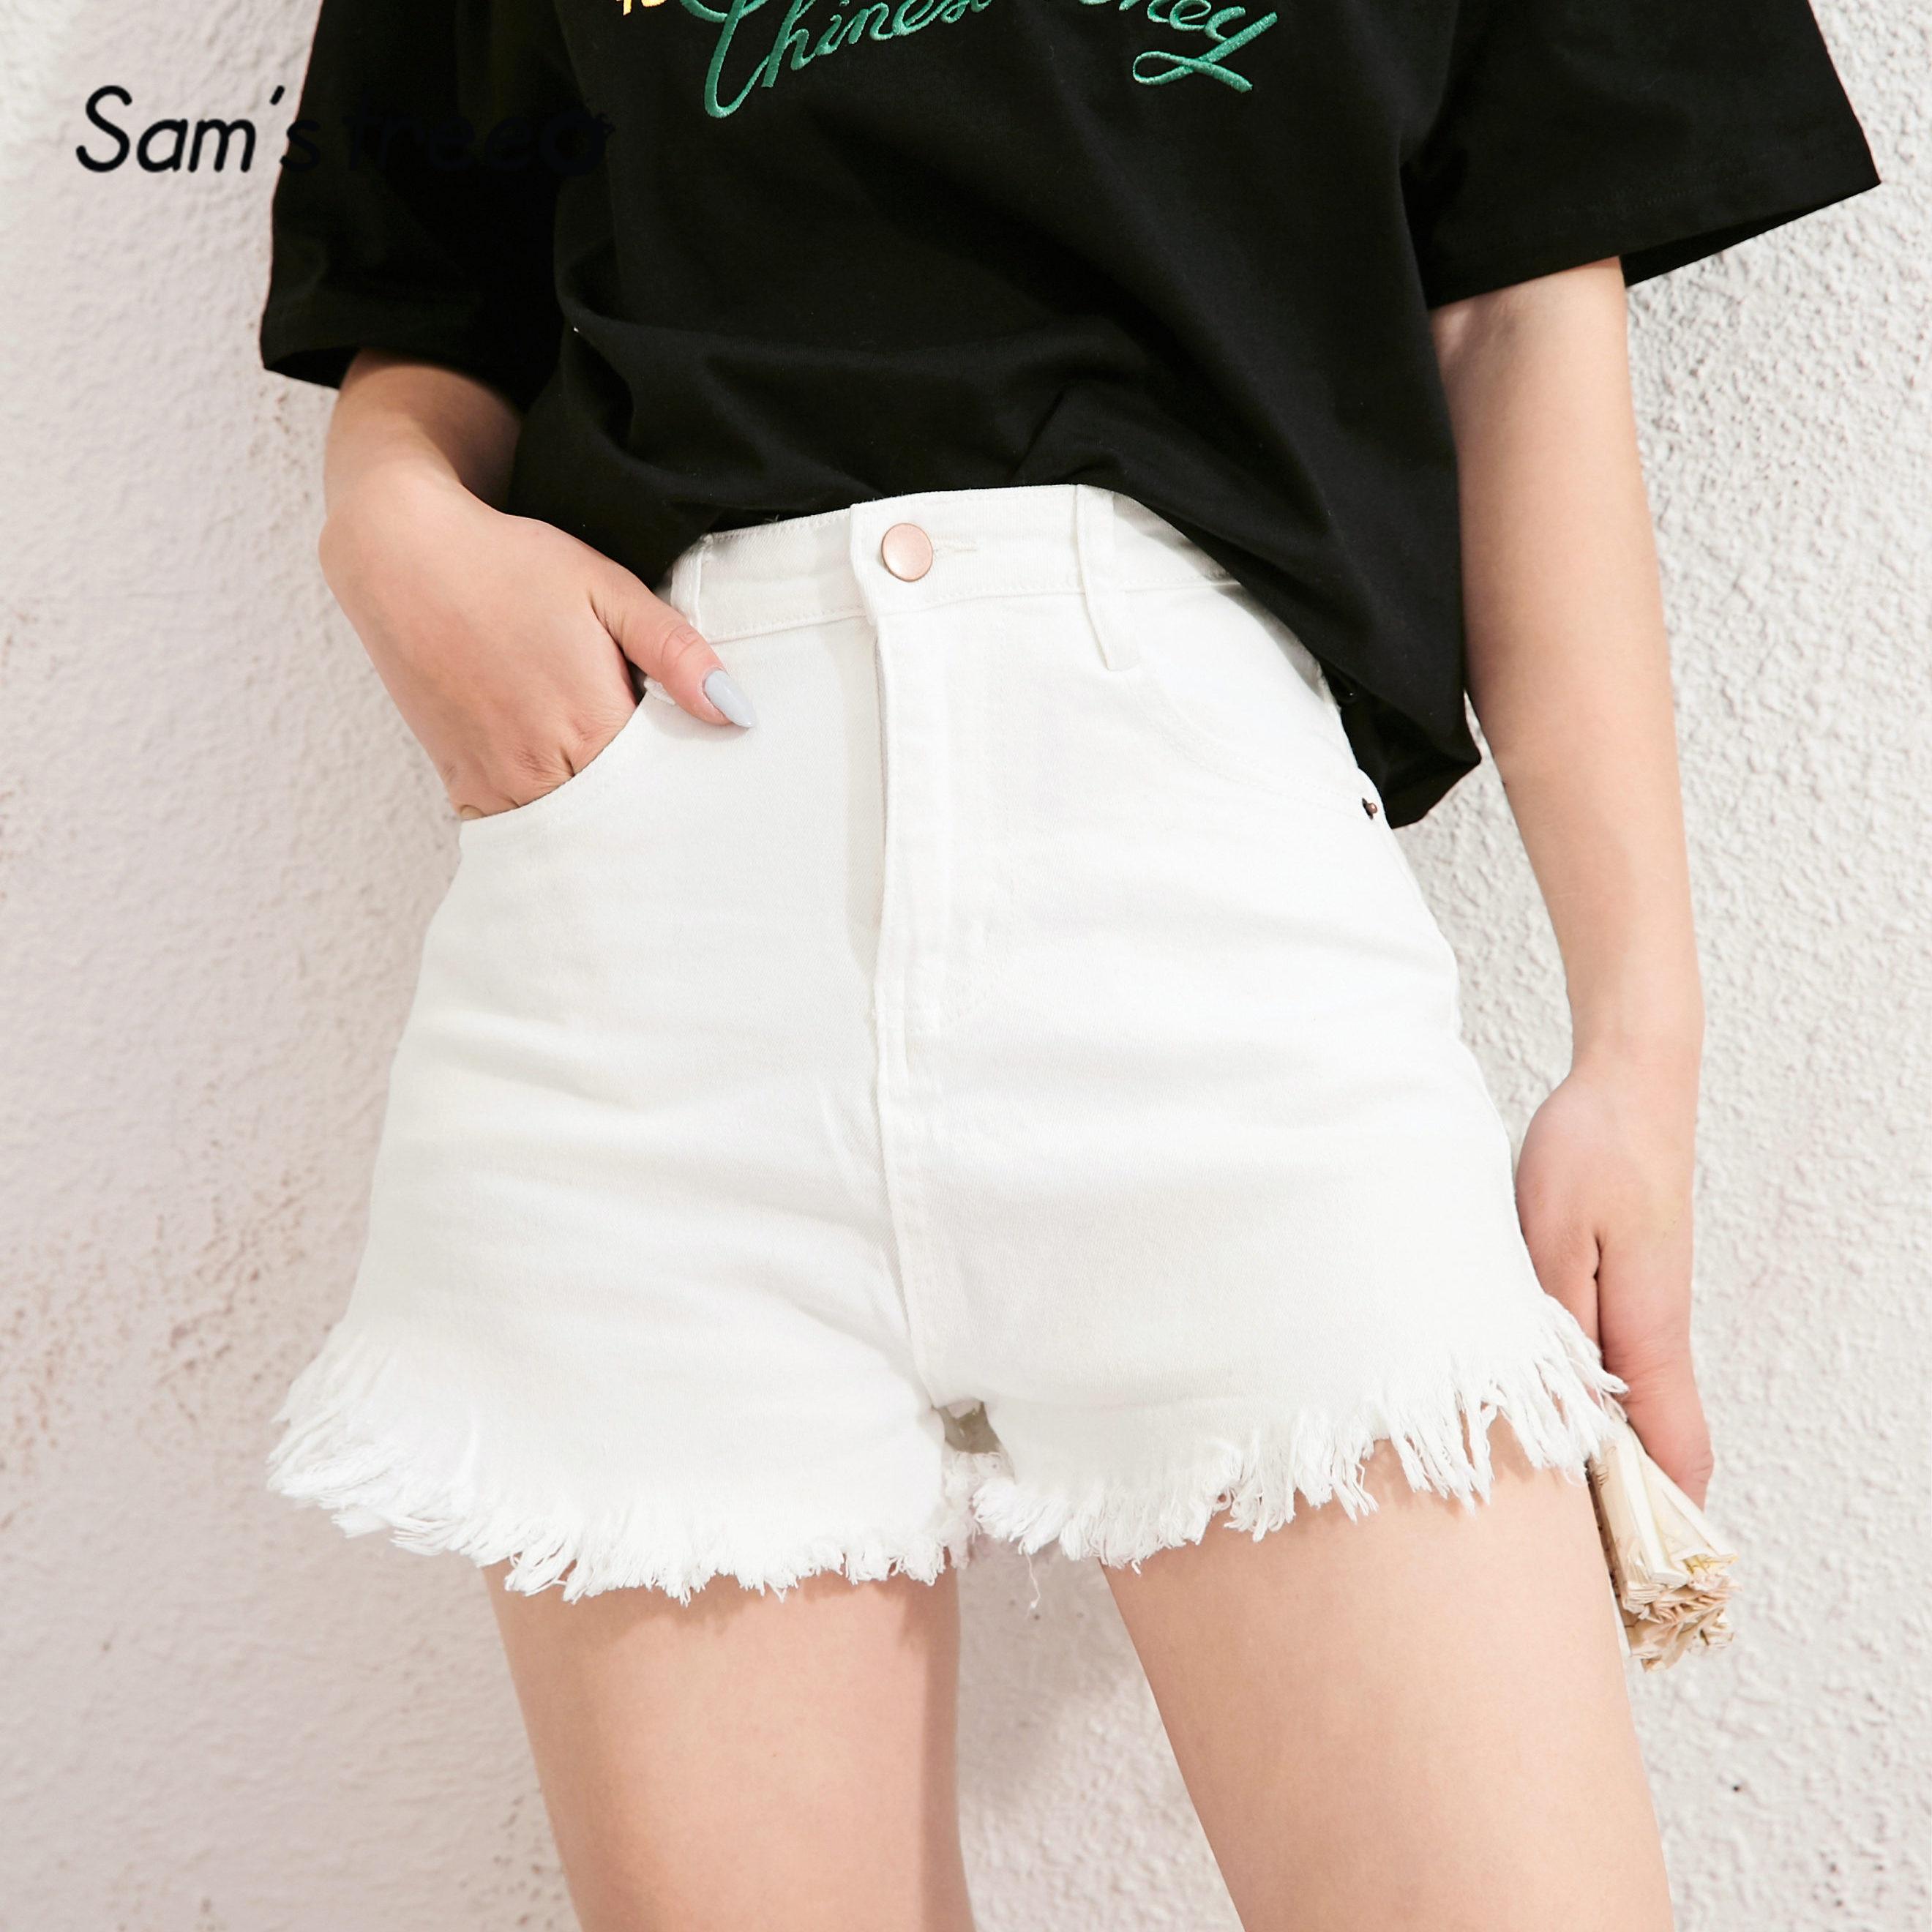 SAM'S TREE White Solid High Waist Casual Korean Women Denim Shorts 2020 Summer New Pure Fringed Ladies Basic Daily Skinny Bottom